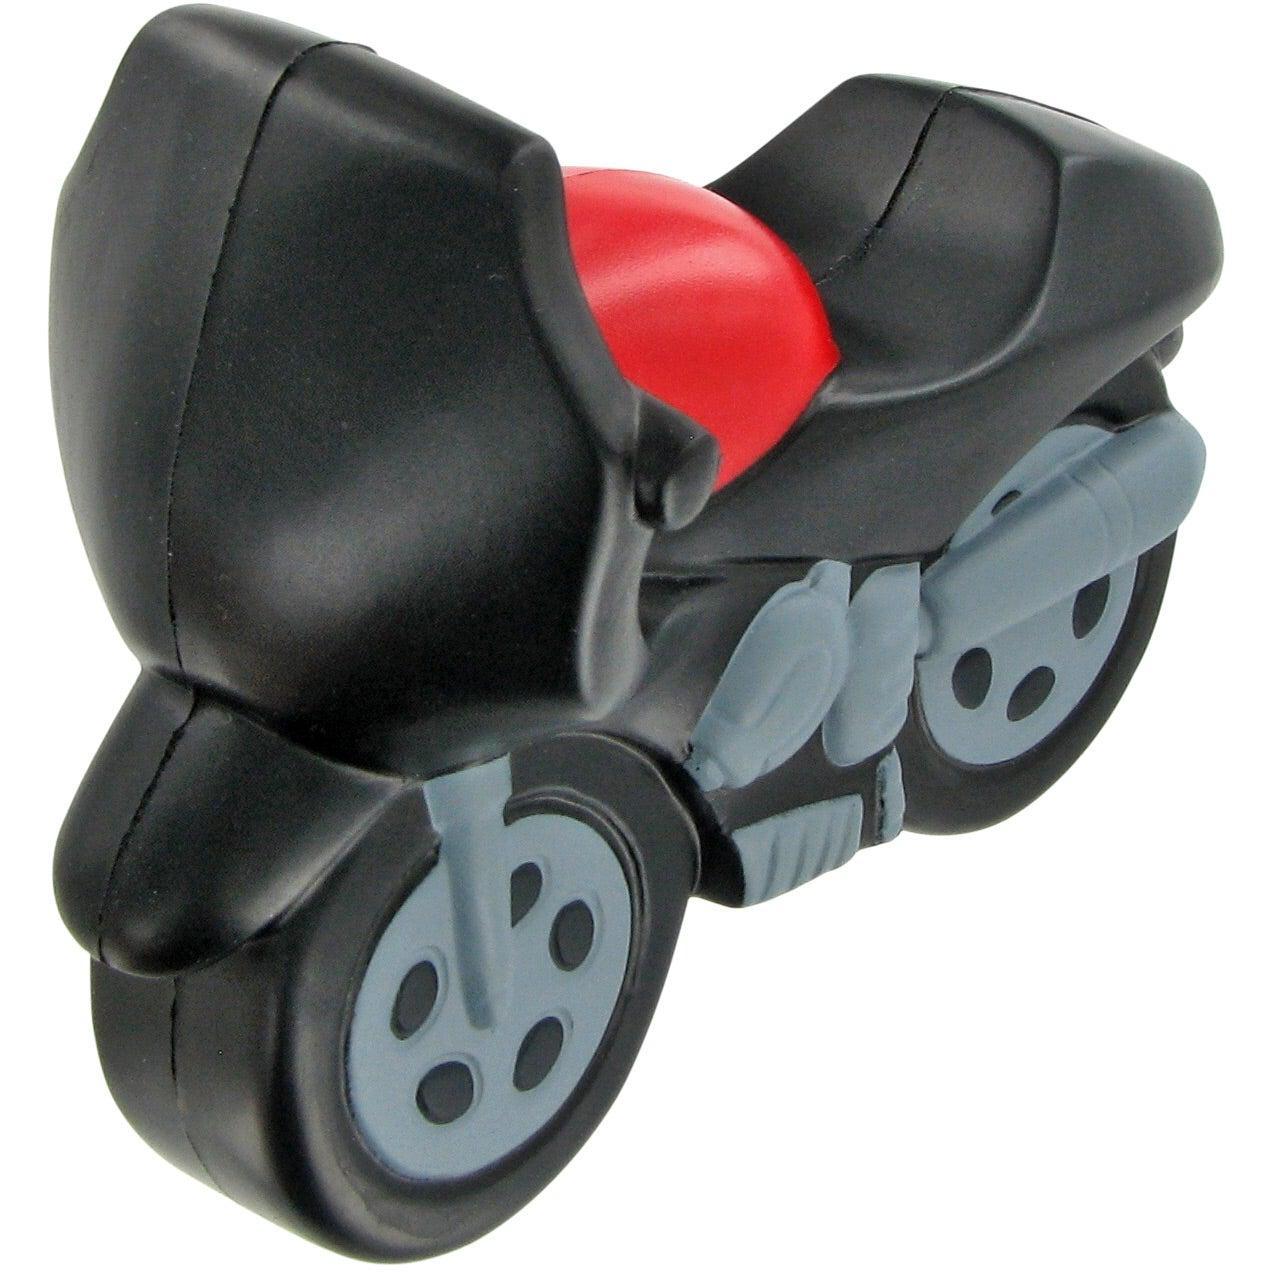 Motorcycle Stress Ball